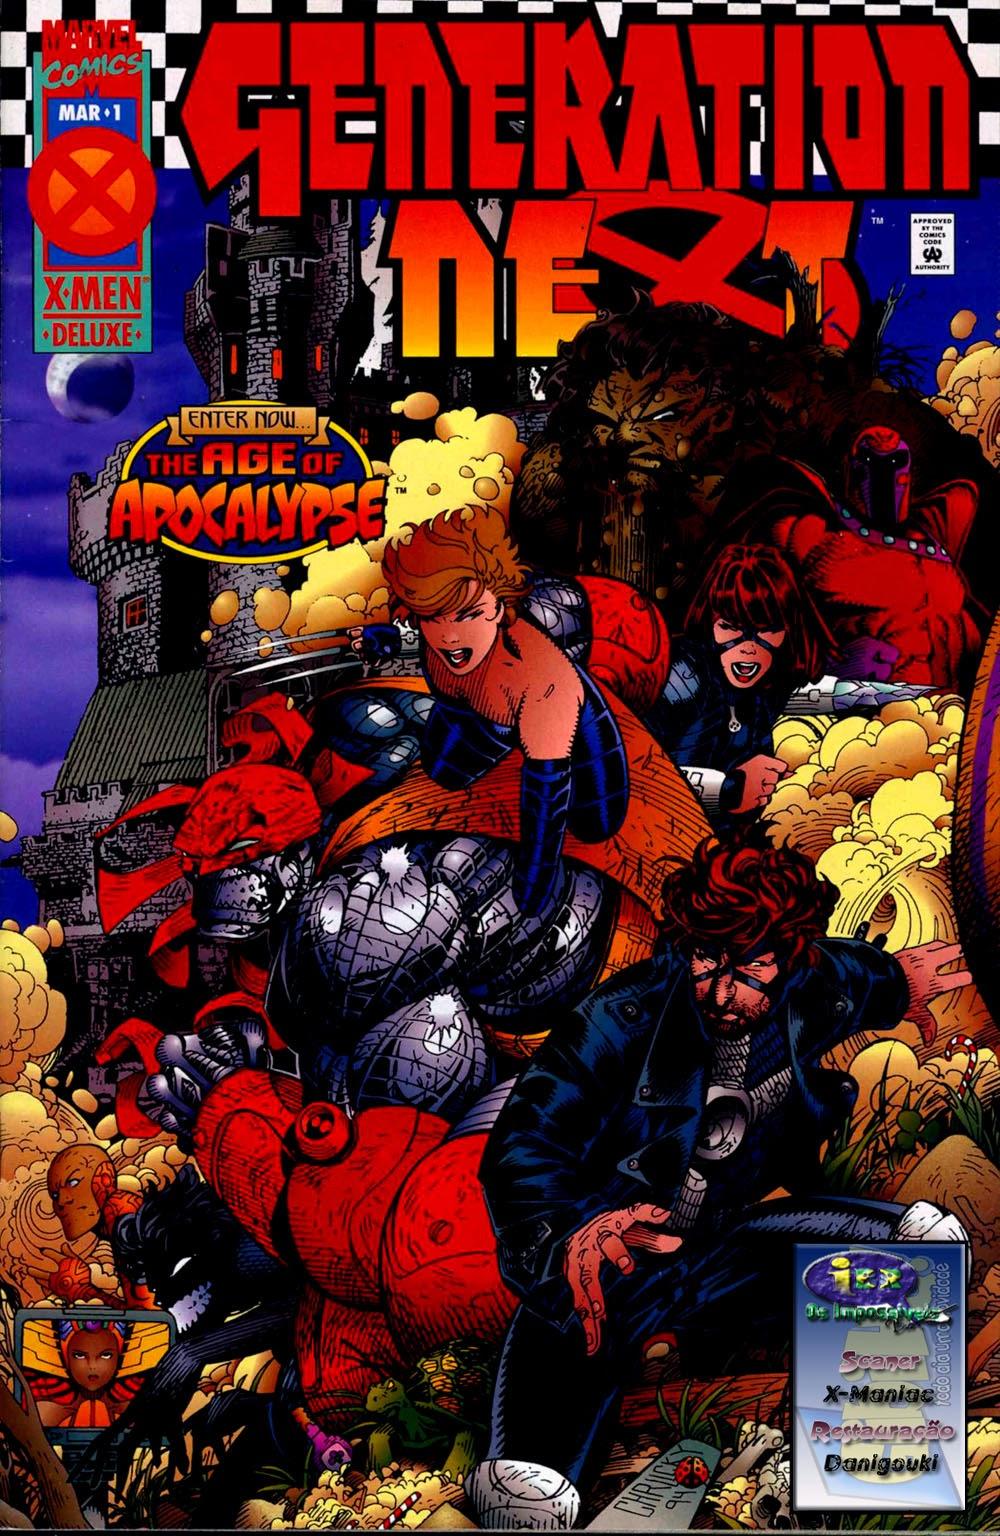 X-Men - A Era do Apocalipse #12